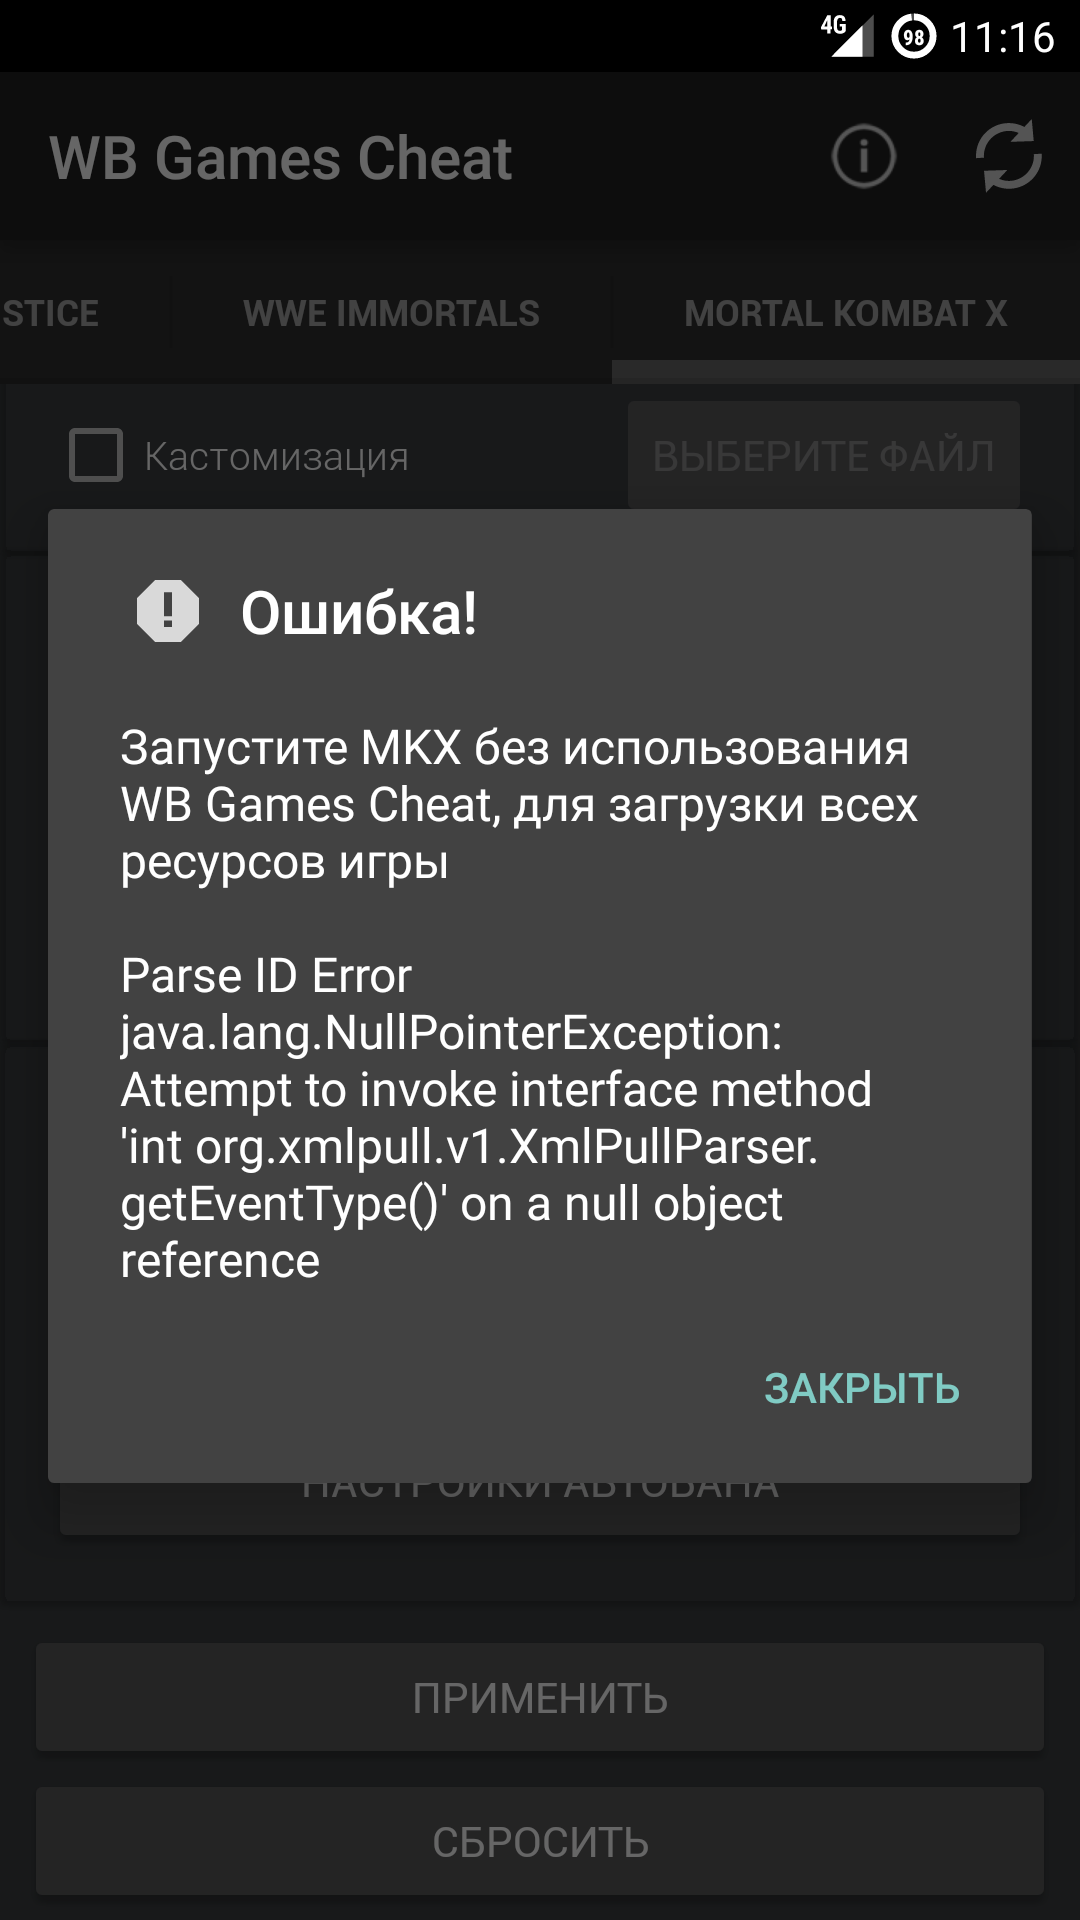 wb games cheat скачать на андроид